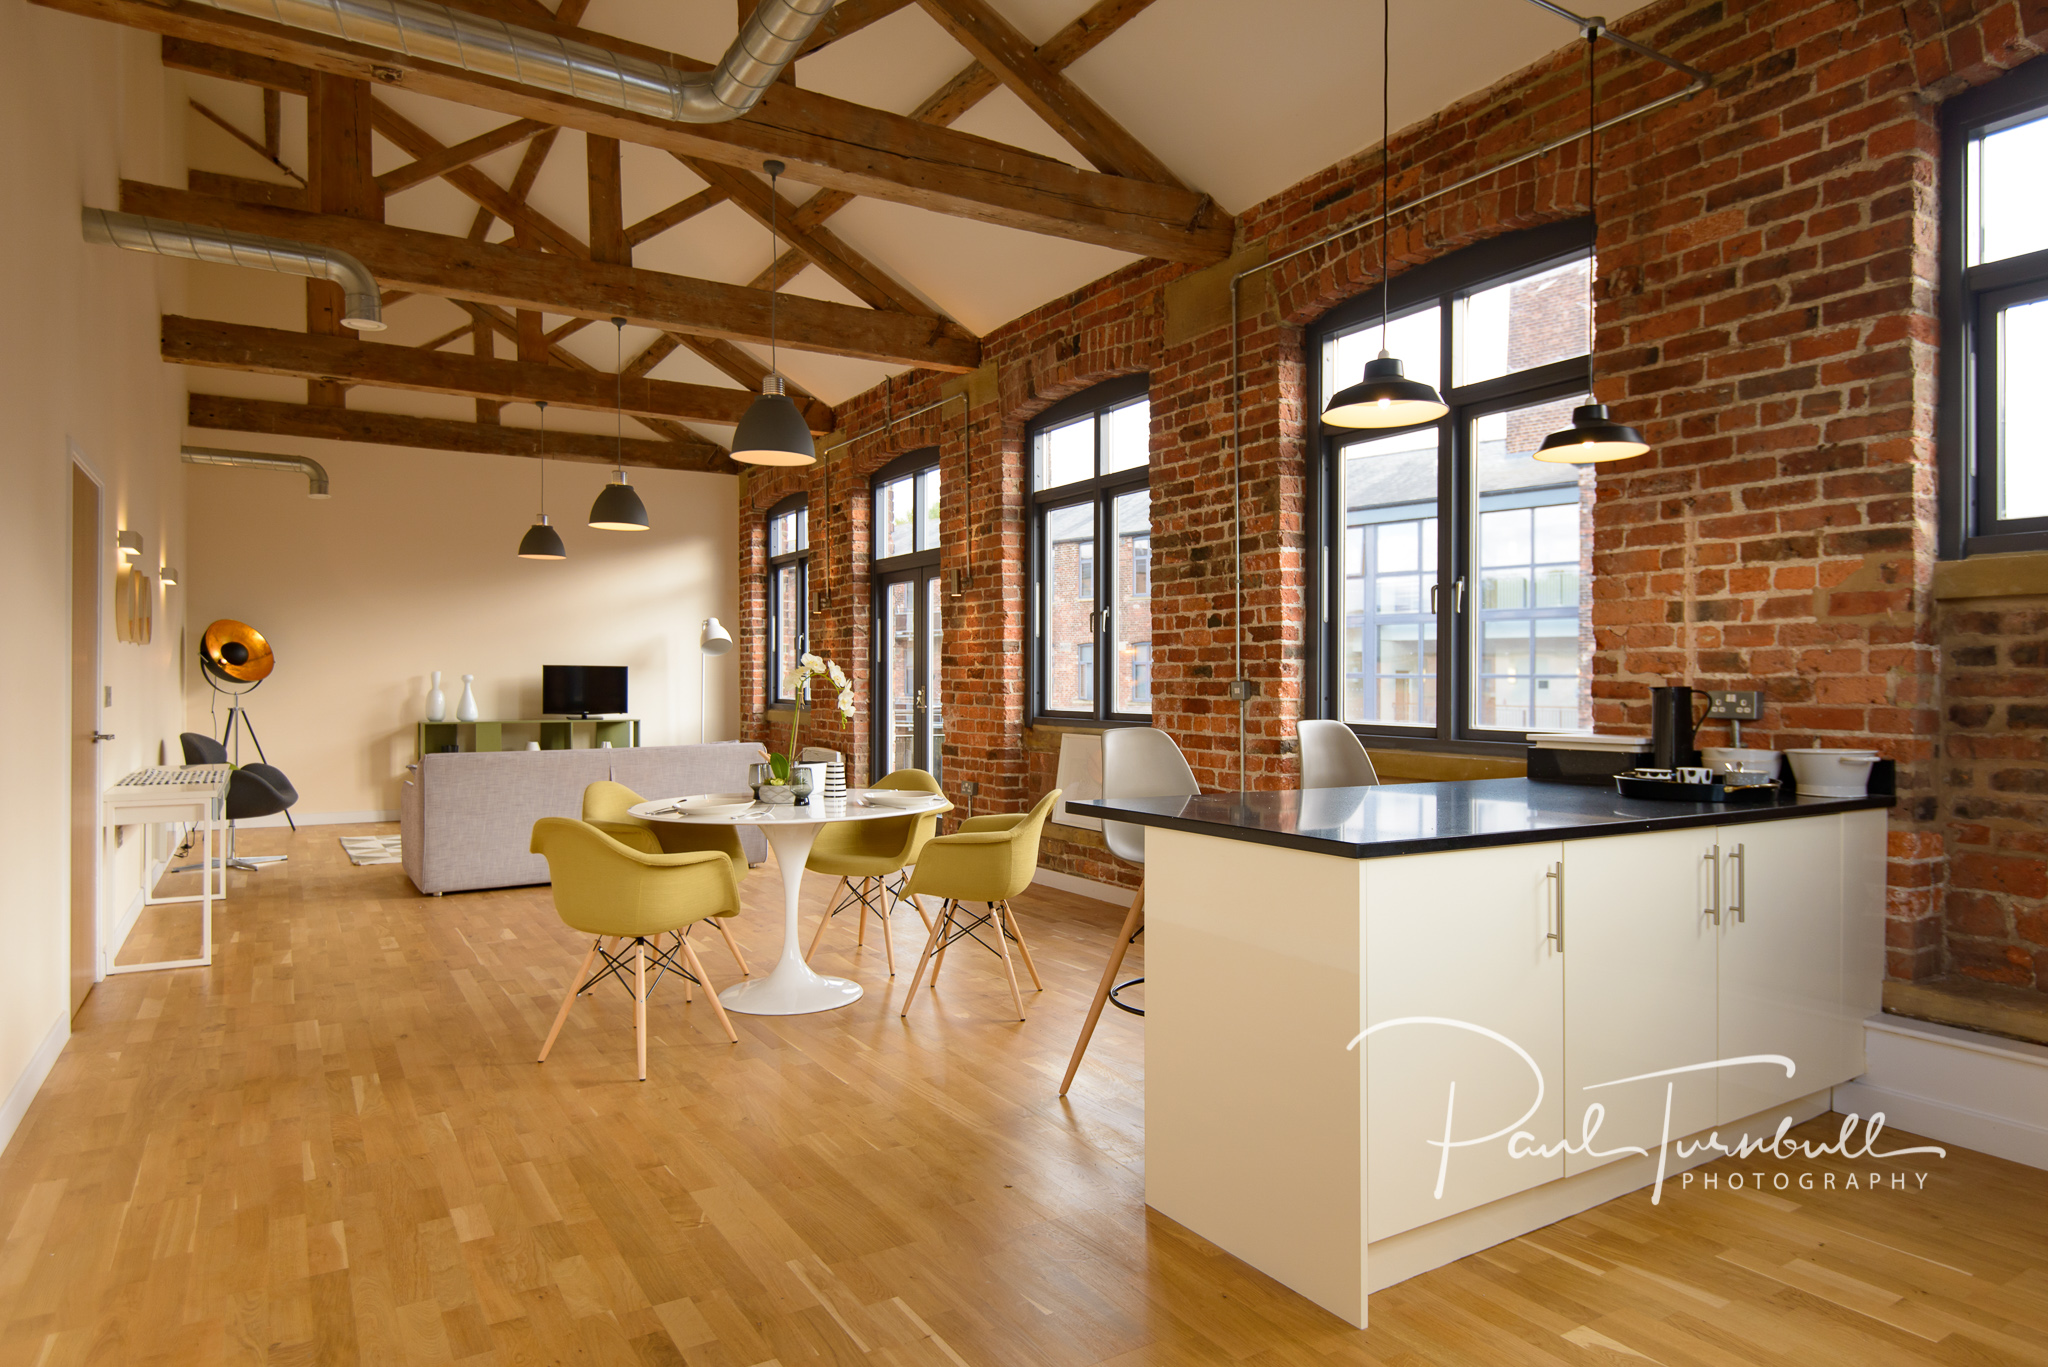 commercial-property-photographer-leeds-yorkshire-blackbrook-developments-013.jpg